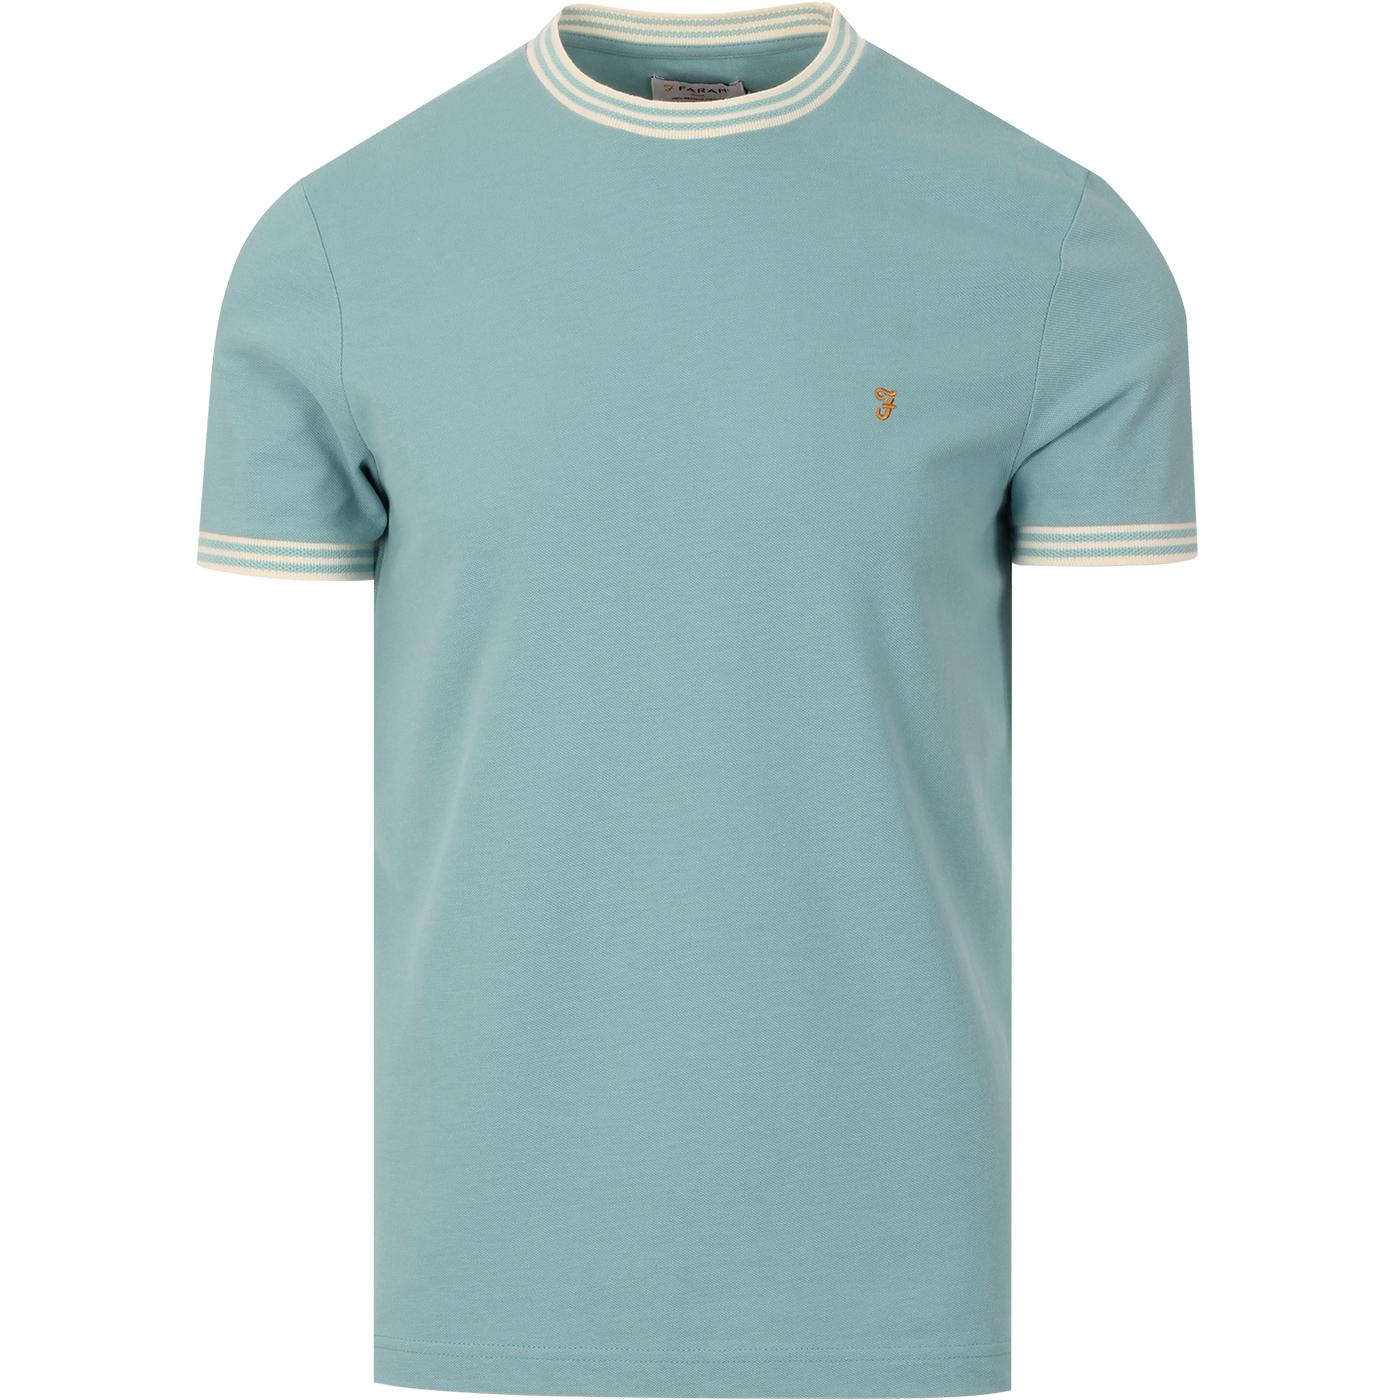 Texas FARAH Retro Mod Tipped Pique T-shirt (RG)